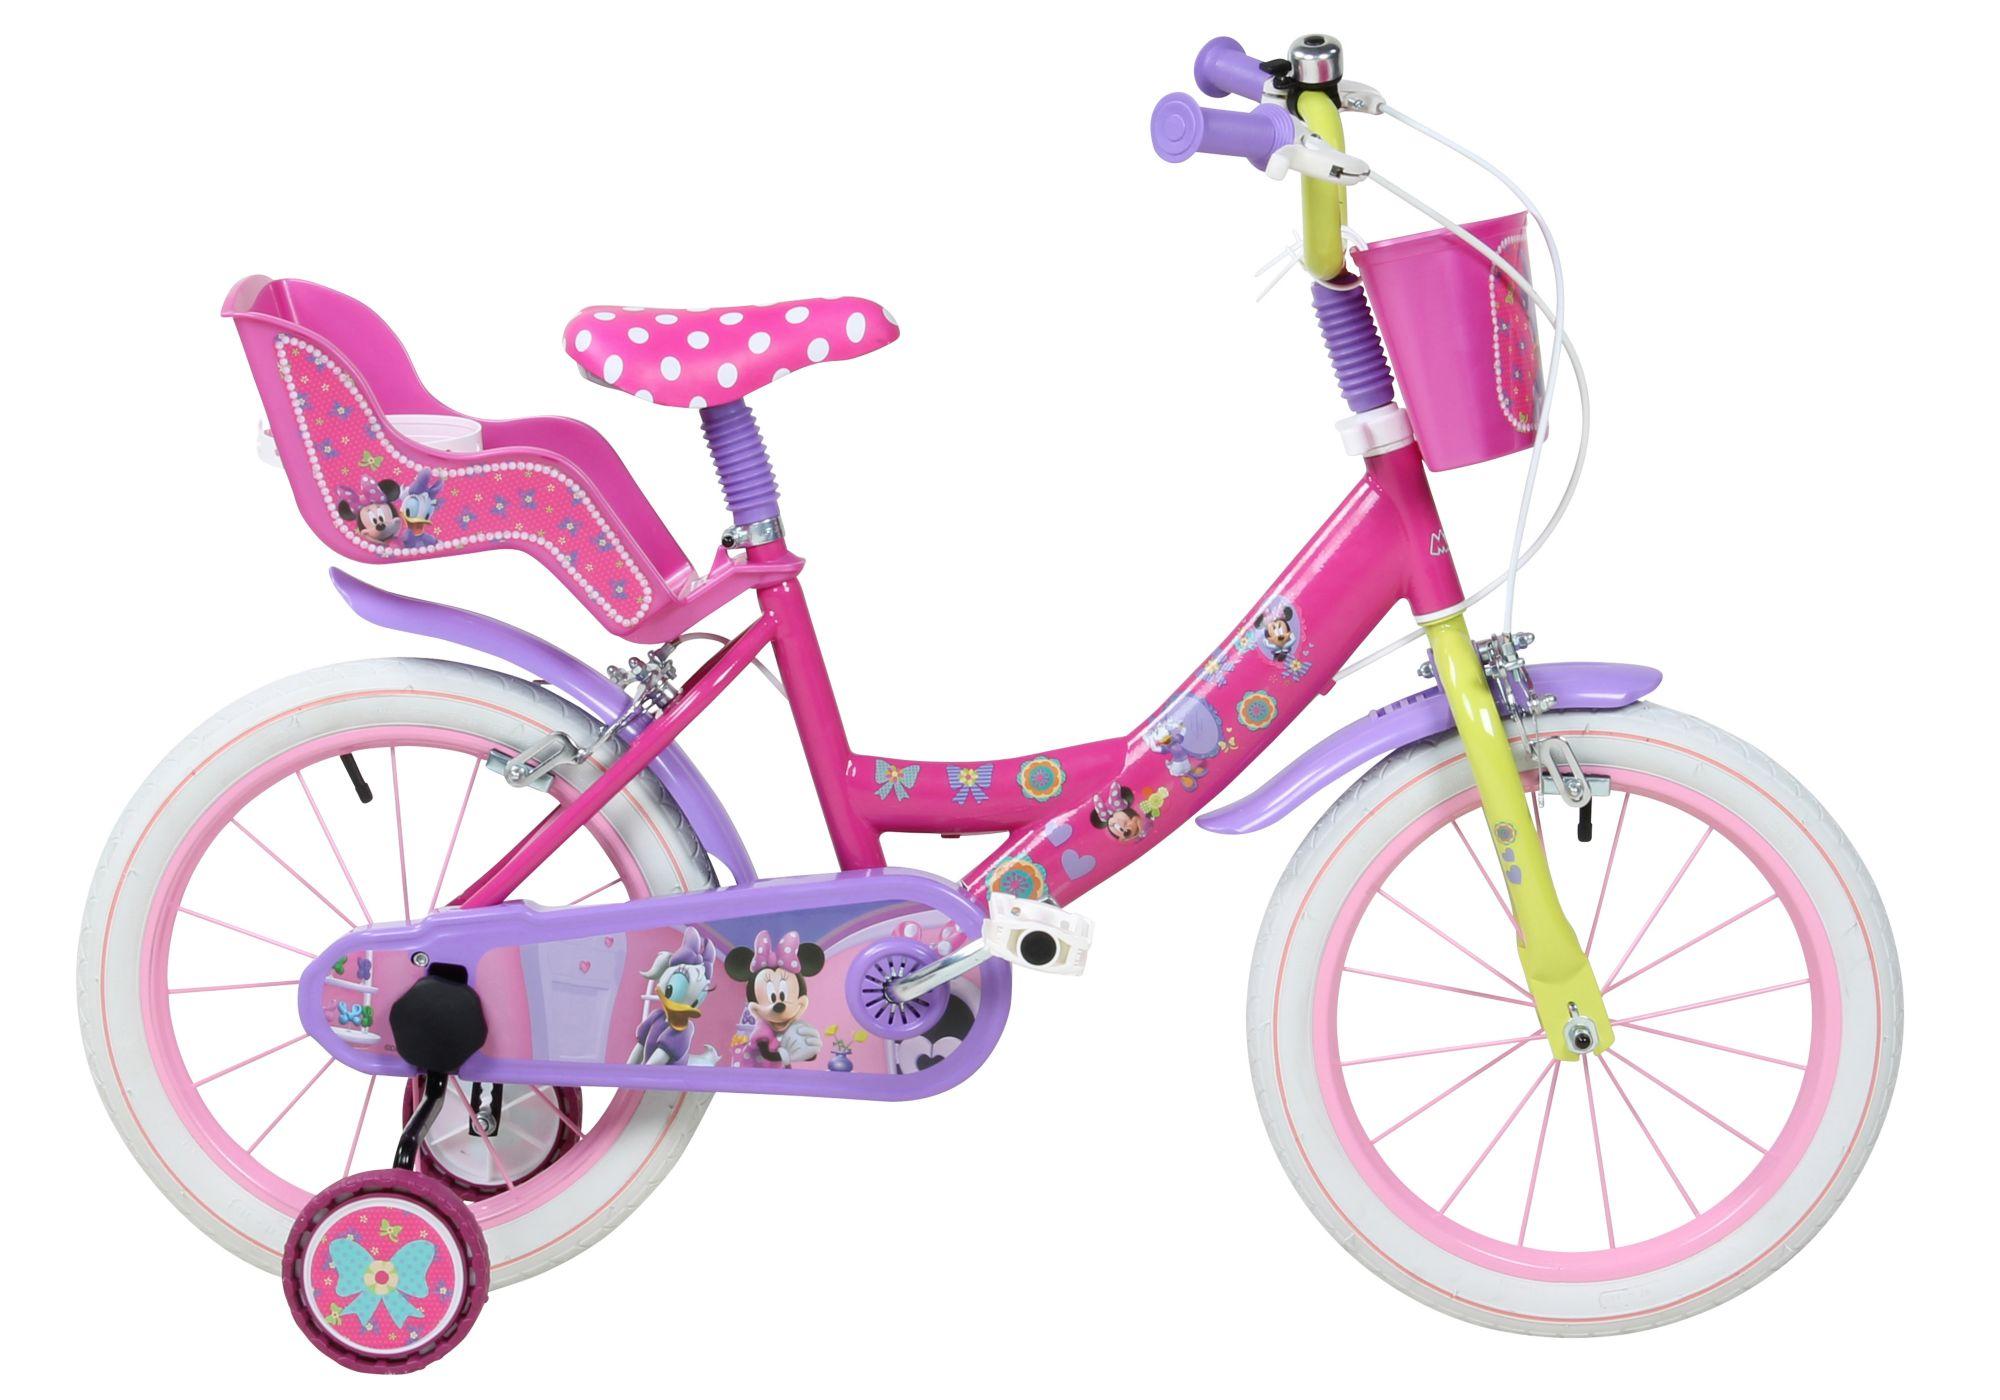 DISNEY Disney Kinderfahrrad Mädchen, 16 Zoll, U-Brakes, »Minnie«